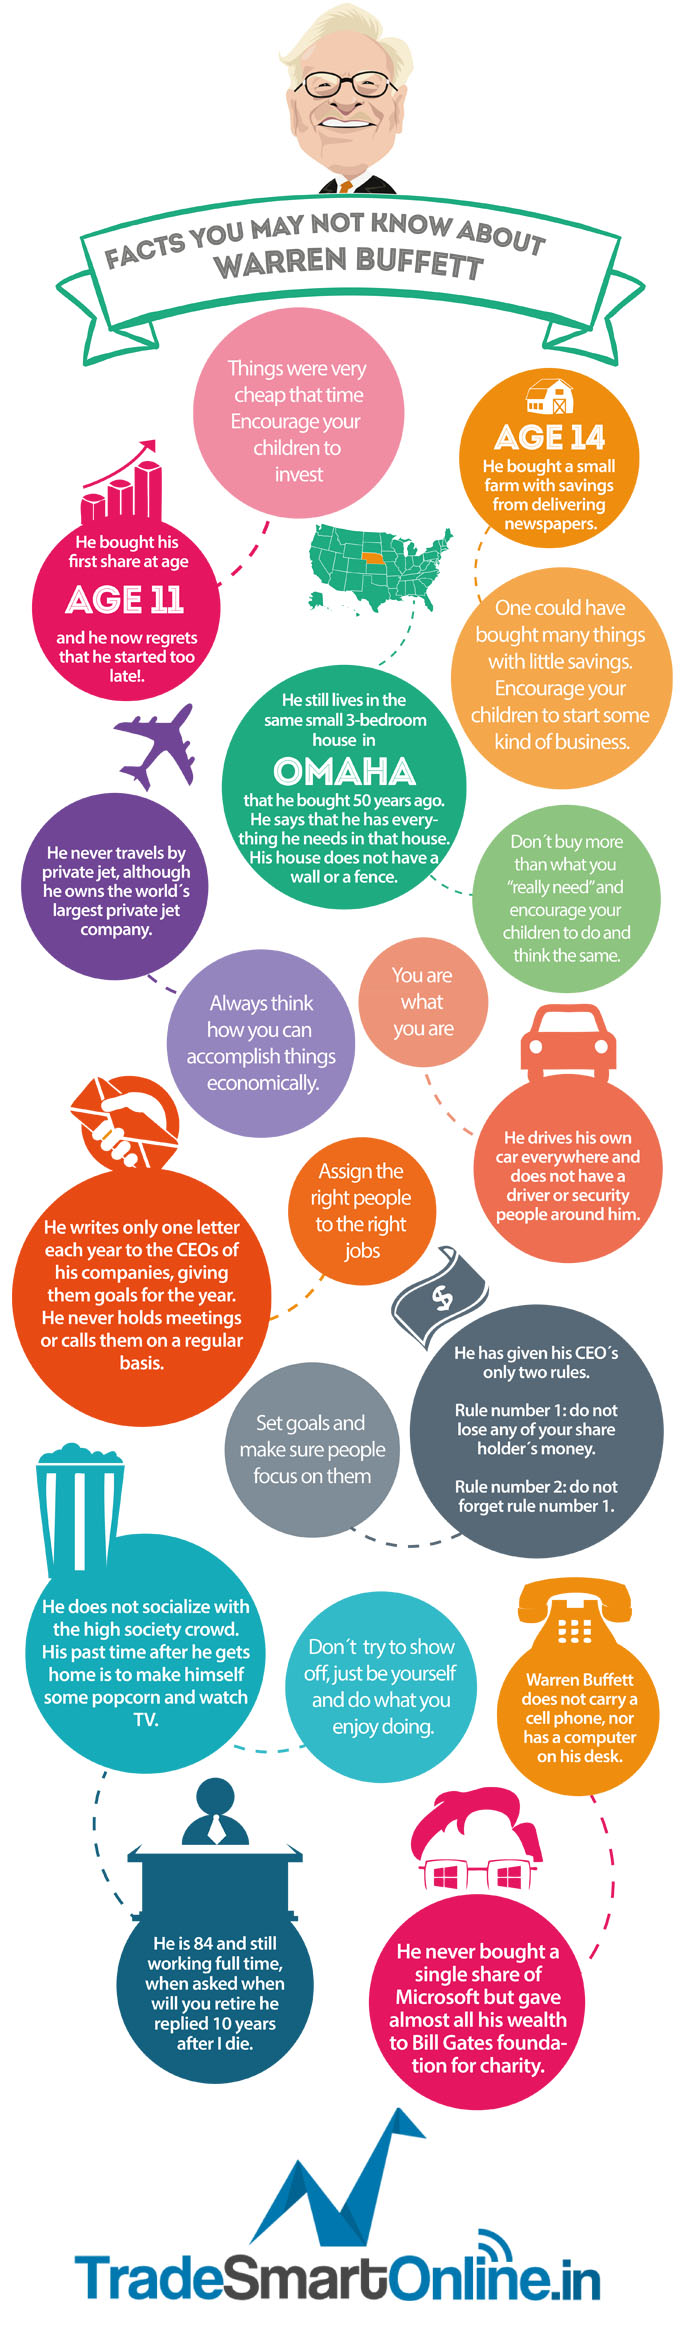 Warrent Buffet Infographic1 - Must- Know Facts About Warren Buffet